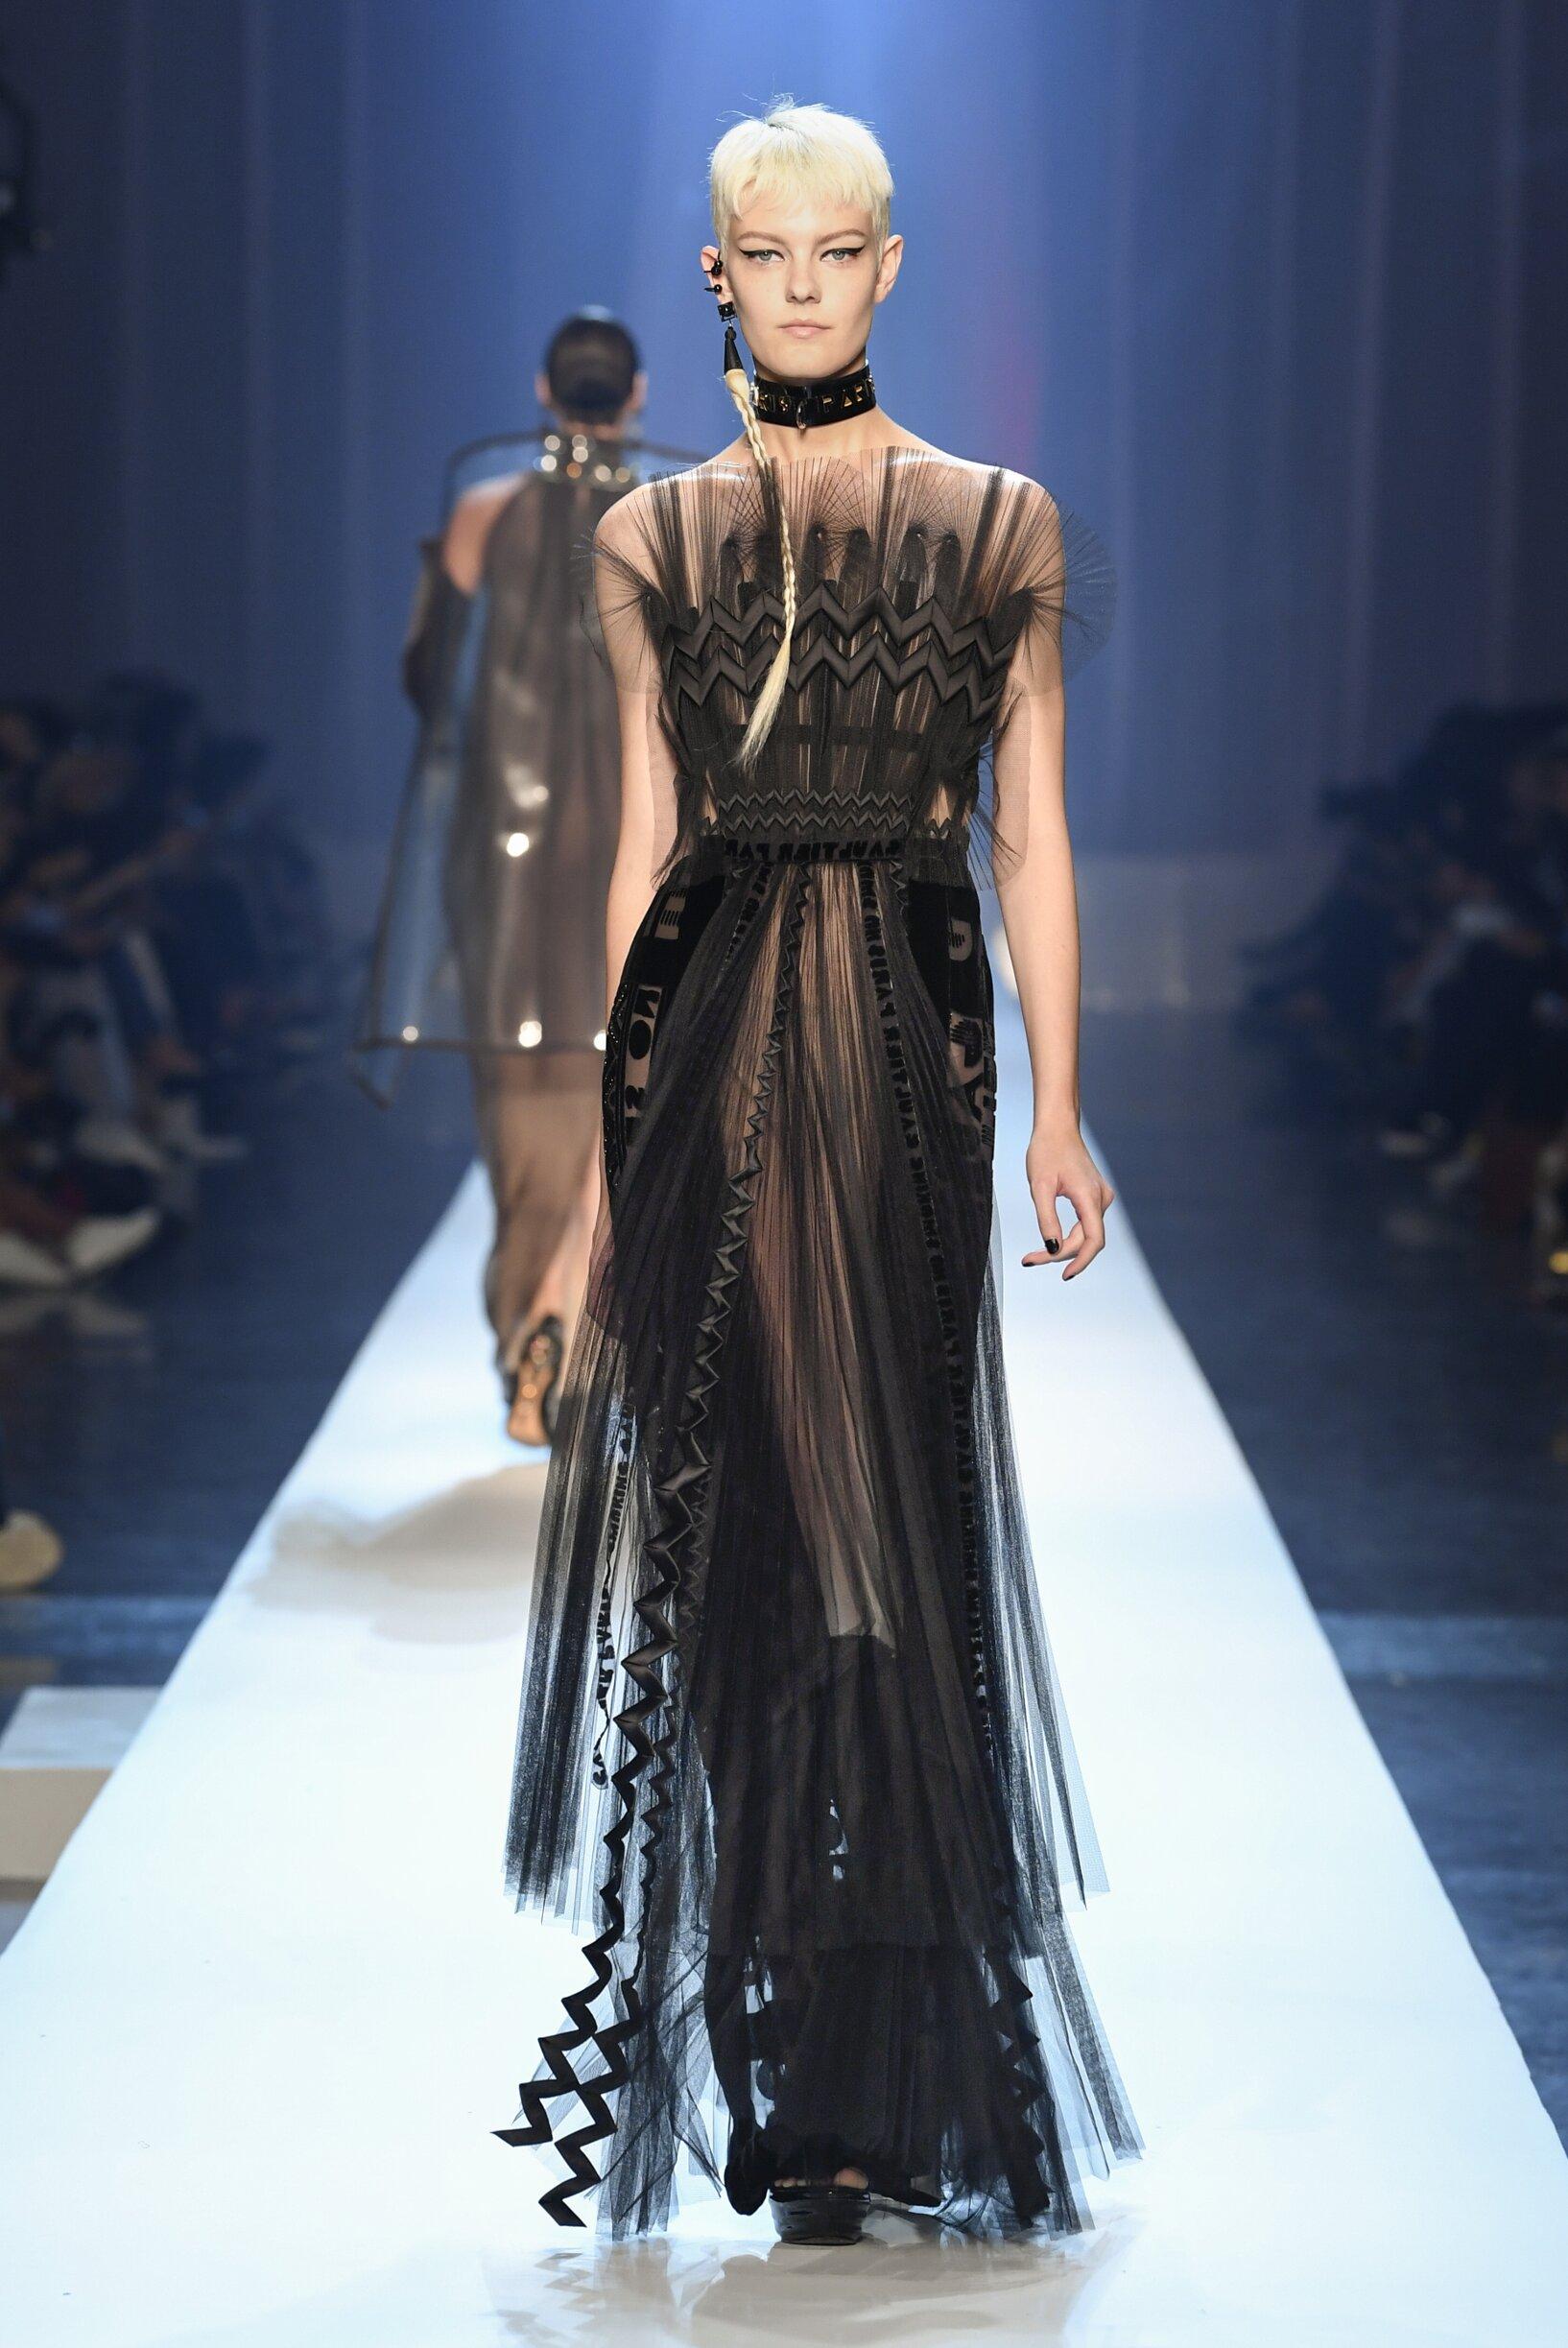 2018 Catwalk Jean-Paul Gaultier Haute Couture Woman Fashion Show Winter